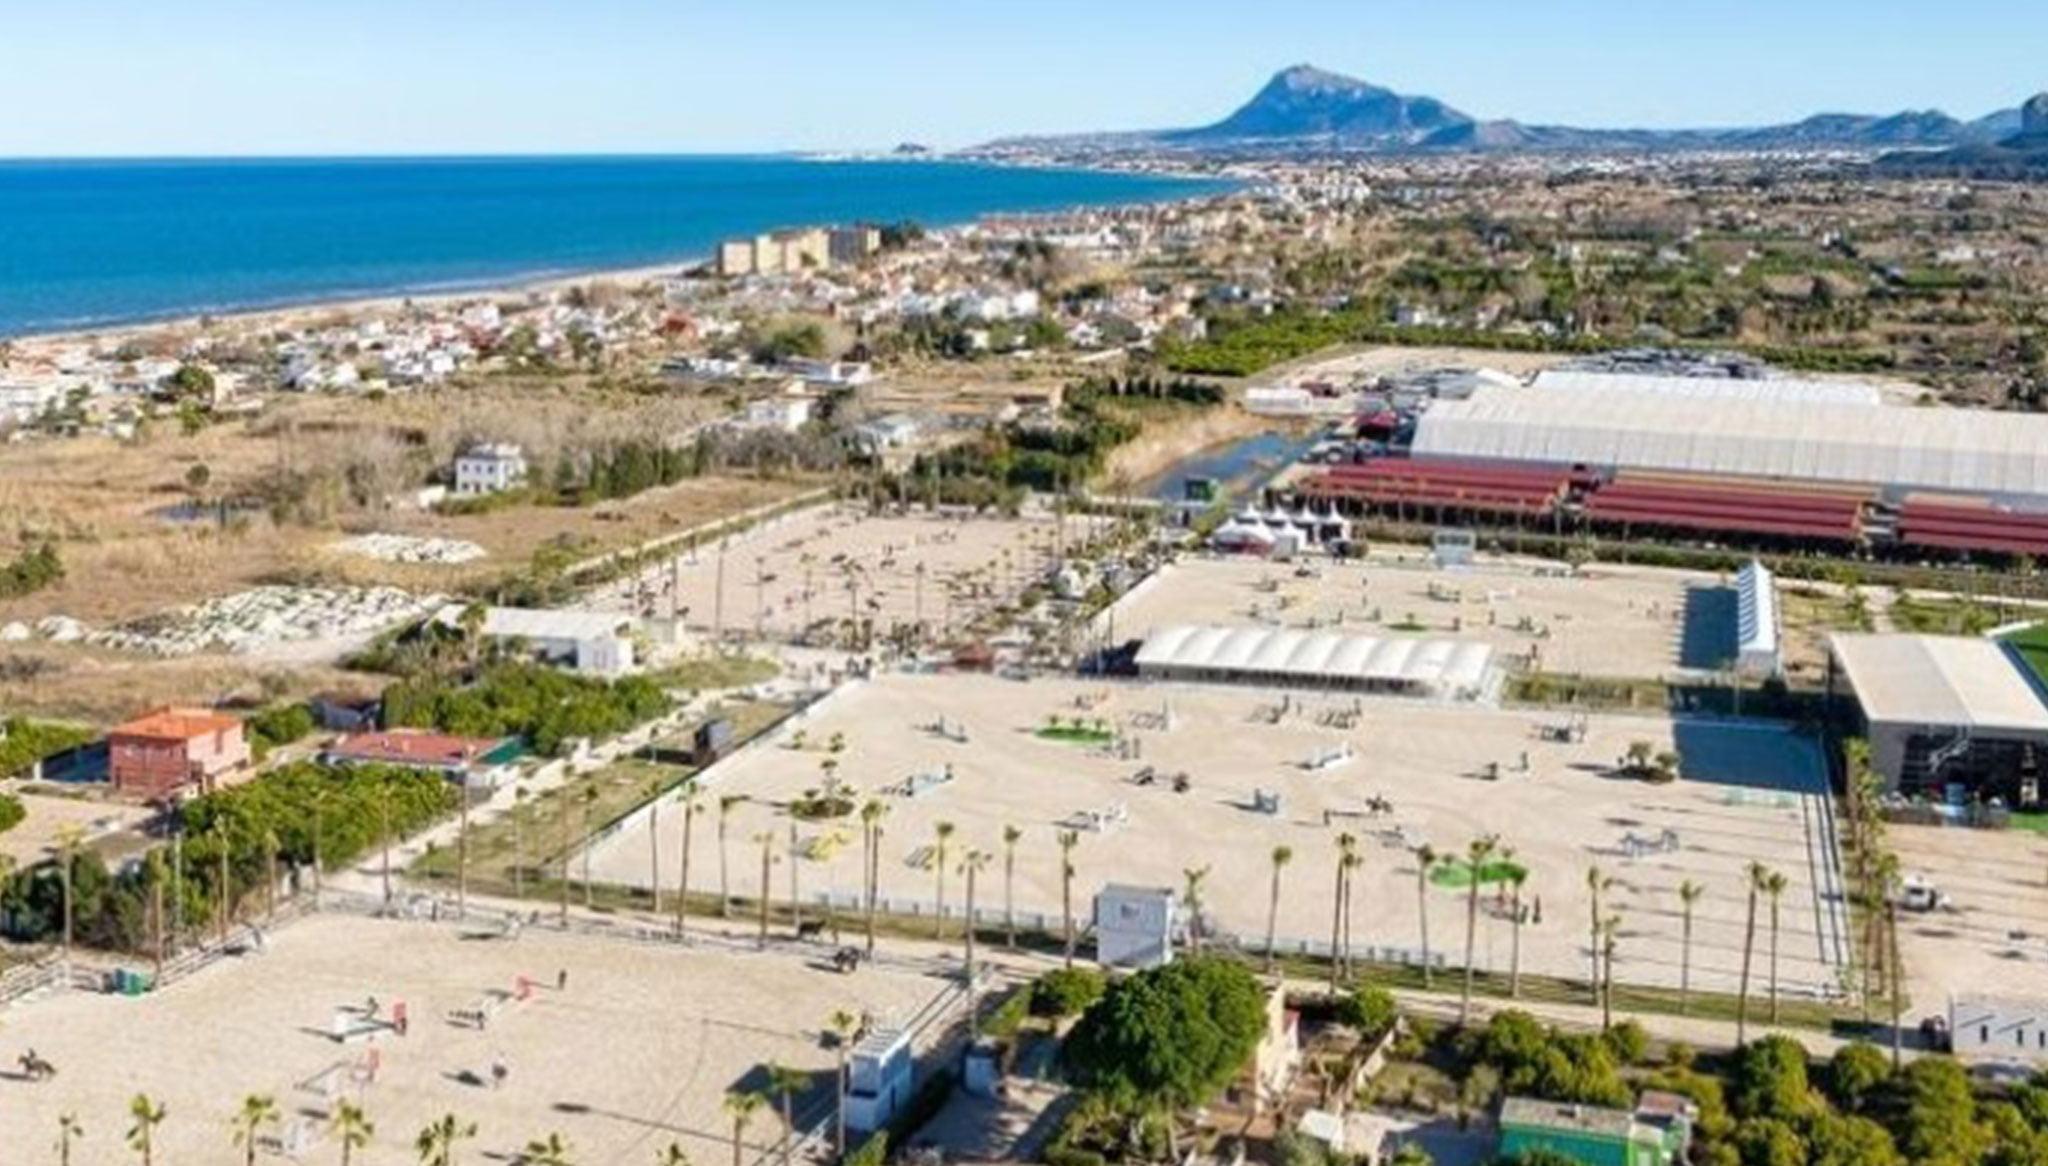 Aerial view of the Oliva Nova facilities